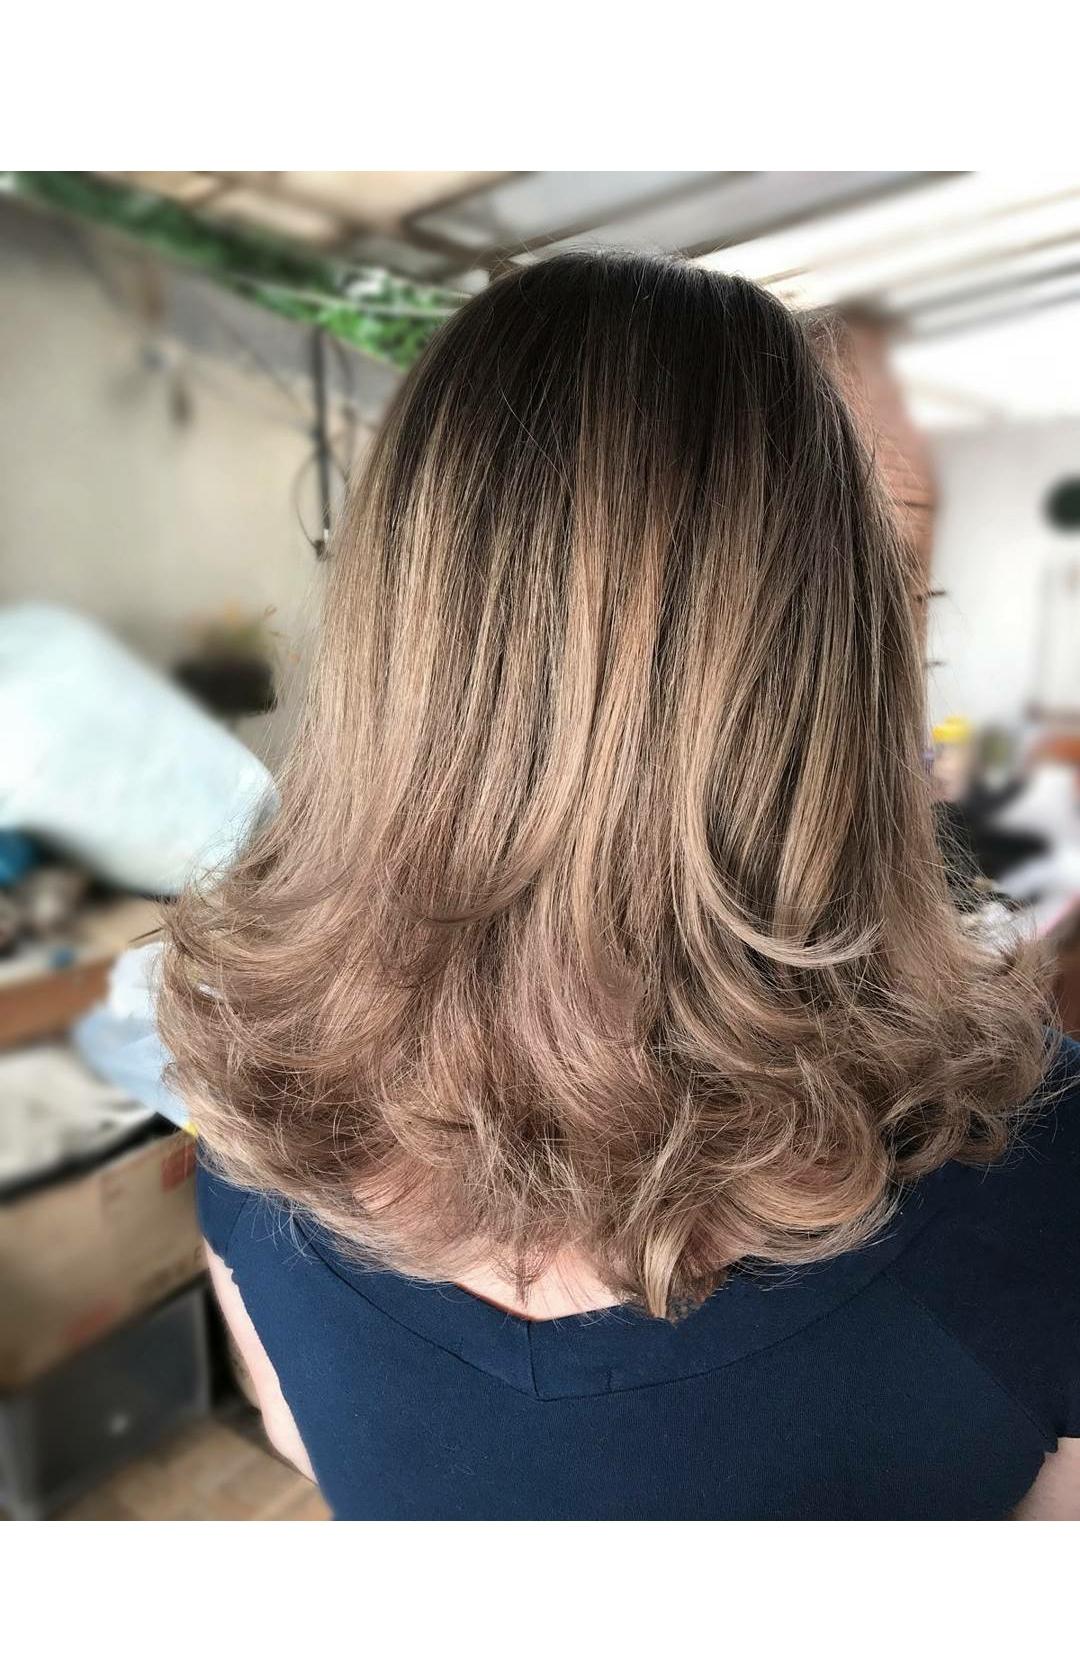 #luzes #ombrehair #ombrehighlights #haircut #chanel #blonde #hair #loirodossonhos #job #transformation #transformacao #cabelos #cabelosloiros #loirossaudaveis #loirosdivos #loirosdourados #loirosamanteigados #loirosperolados #loirosplatinados #corte cabelo cabeleireiro(a) stylist / visagista maquiador(a) designer de sobrancelhas